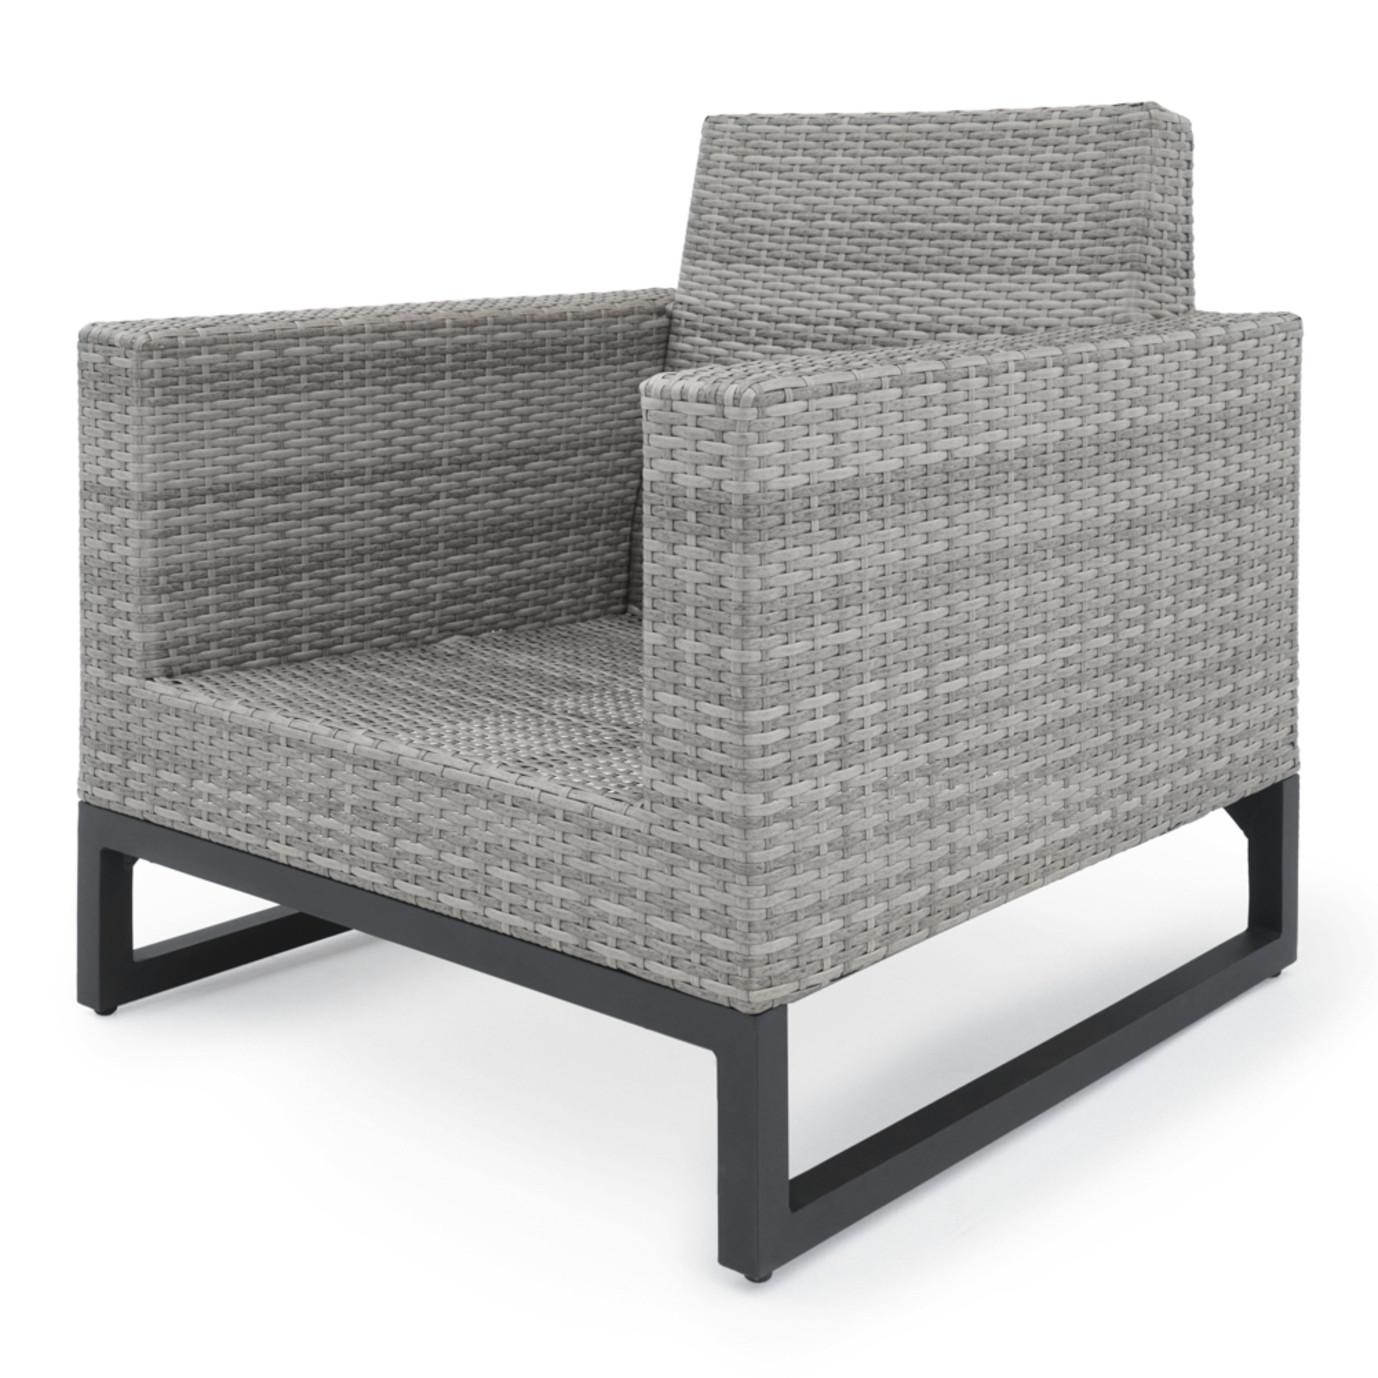 Milo™ Grey 4pc Seating Set - Moroccan Cream